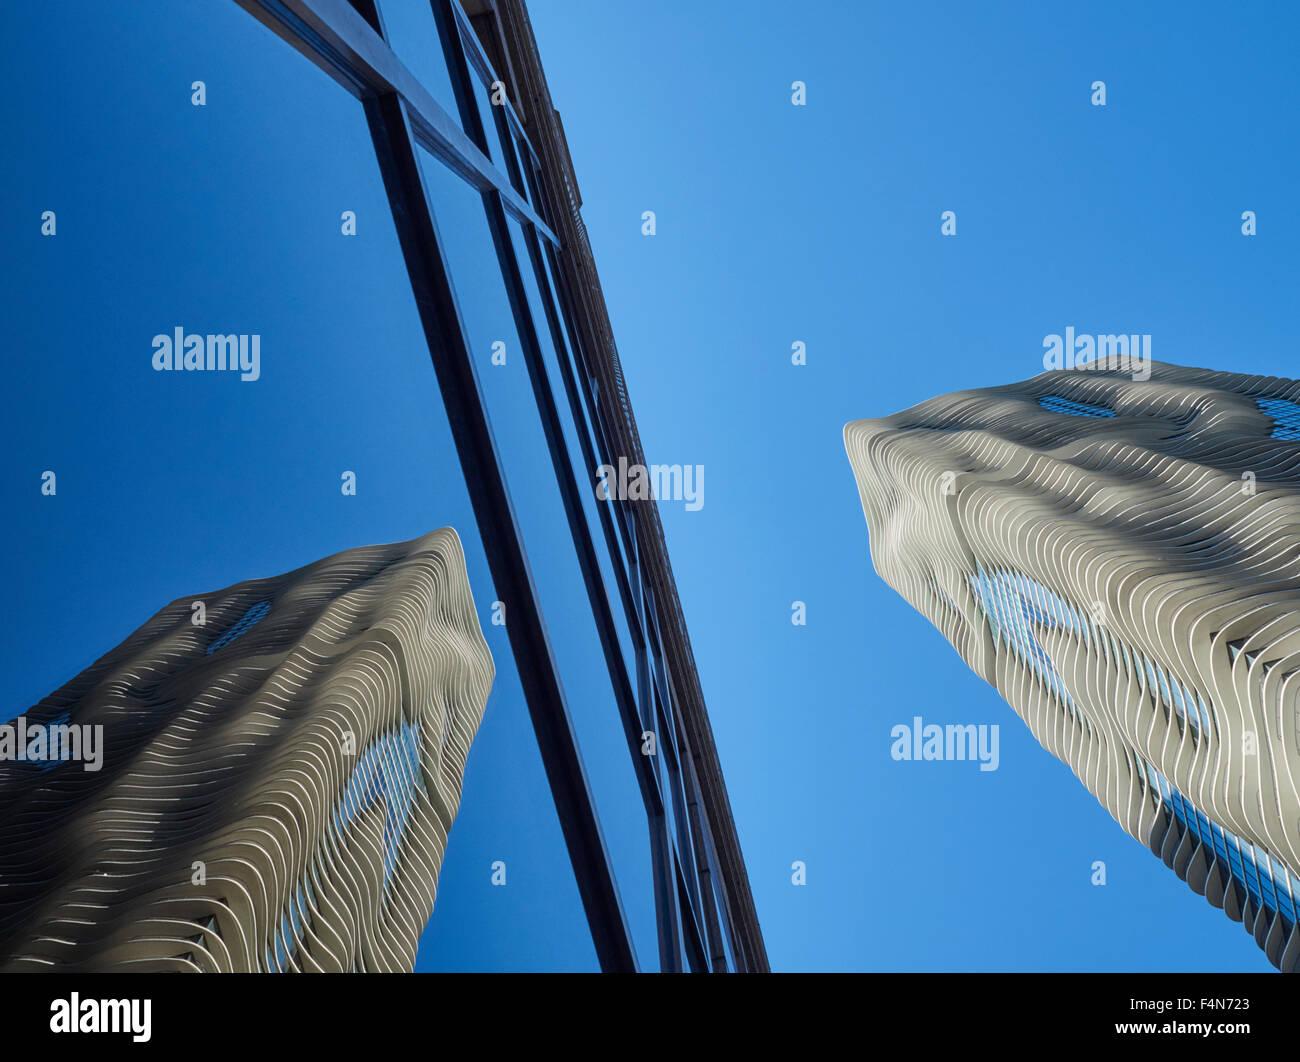 USA, Illinois, Chicago, Aqua Tower, reflexion in glass facade - Stock Image